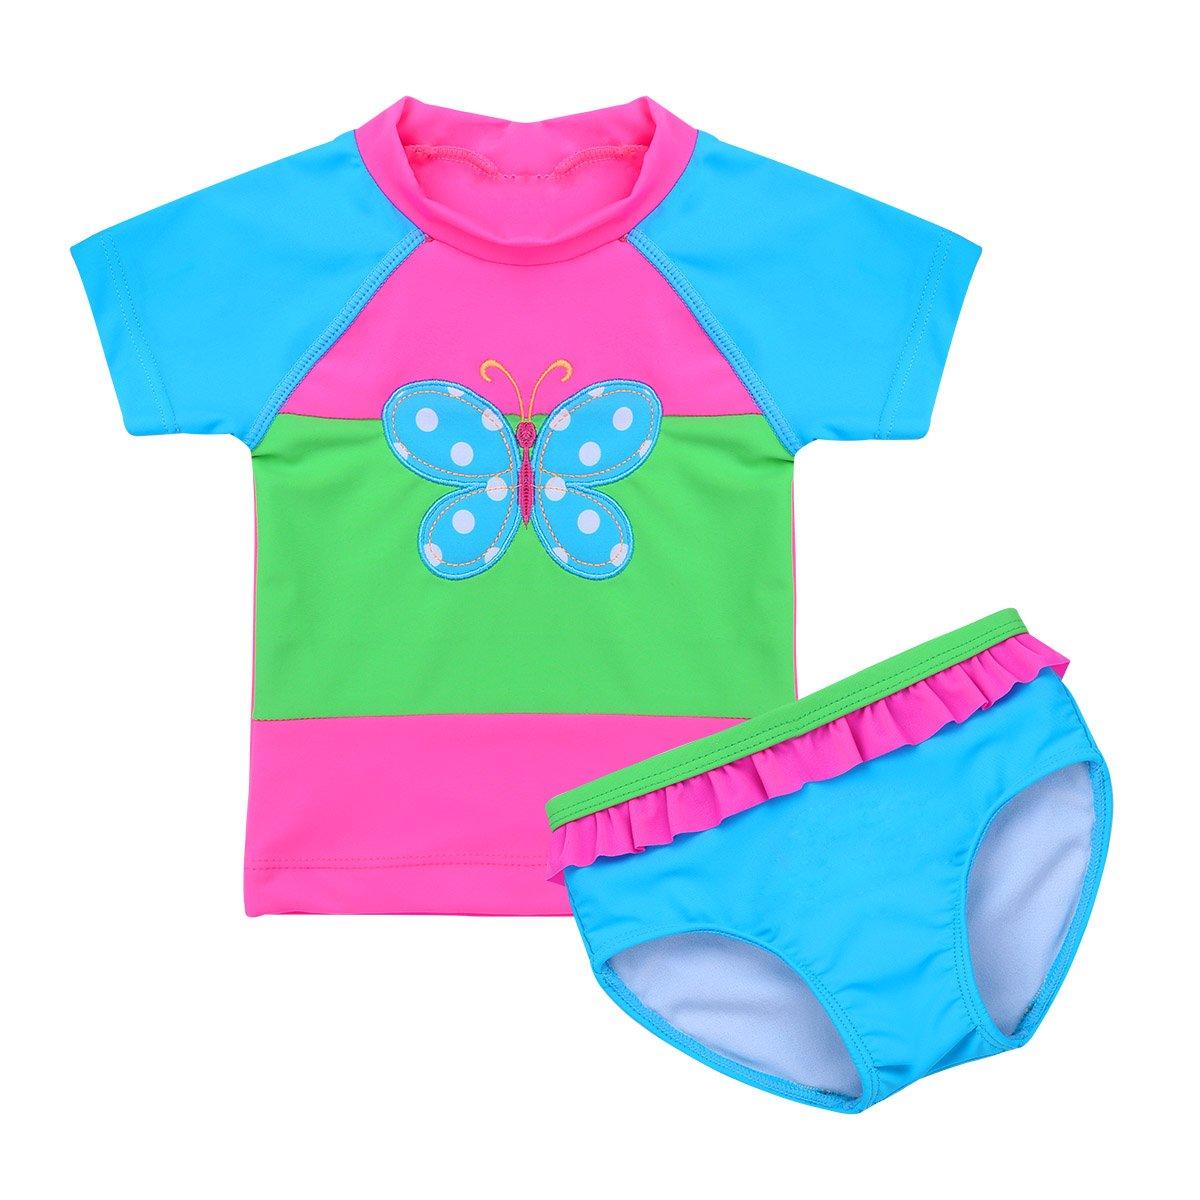 5//6 SO Girls Rashguard Bikini Swimsuit Set Turquoise//Pink X-Small